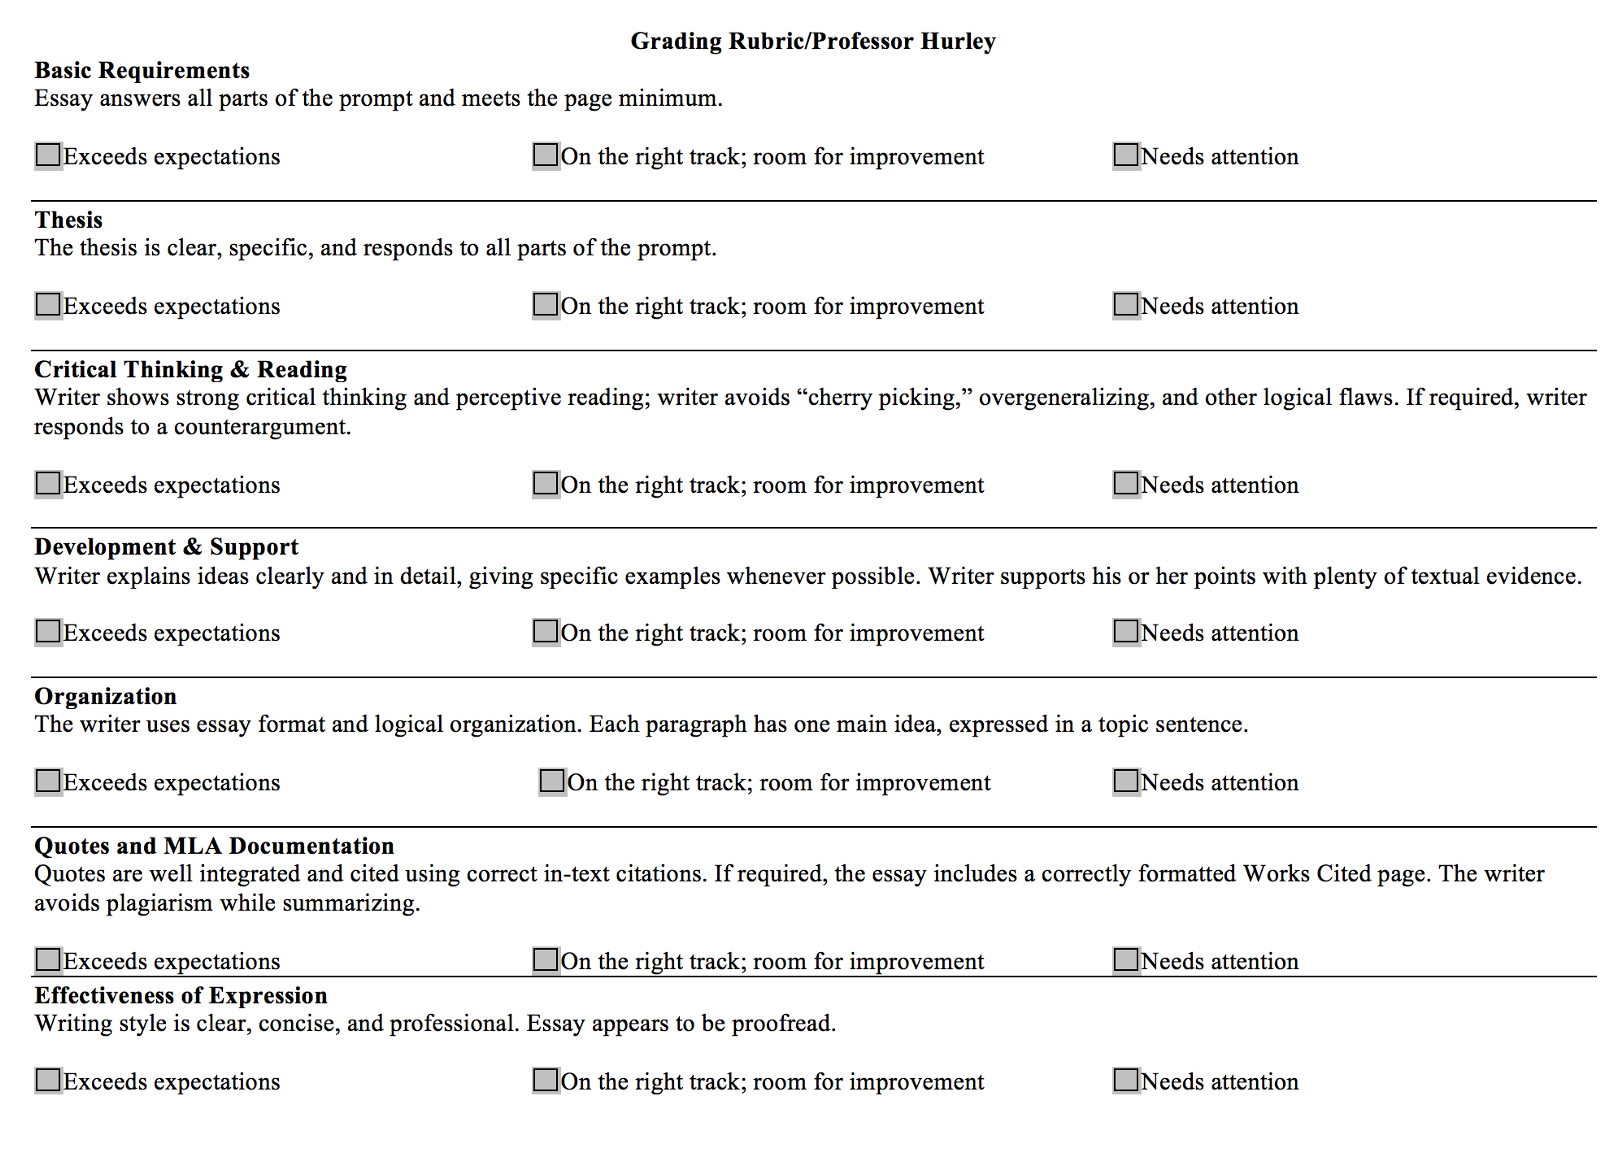 012 Essay Example Rubrics For Writing 1l7bkjqmu2kth Pcoqy7bgg Rare Pdf Contest Full